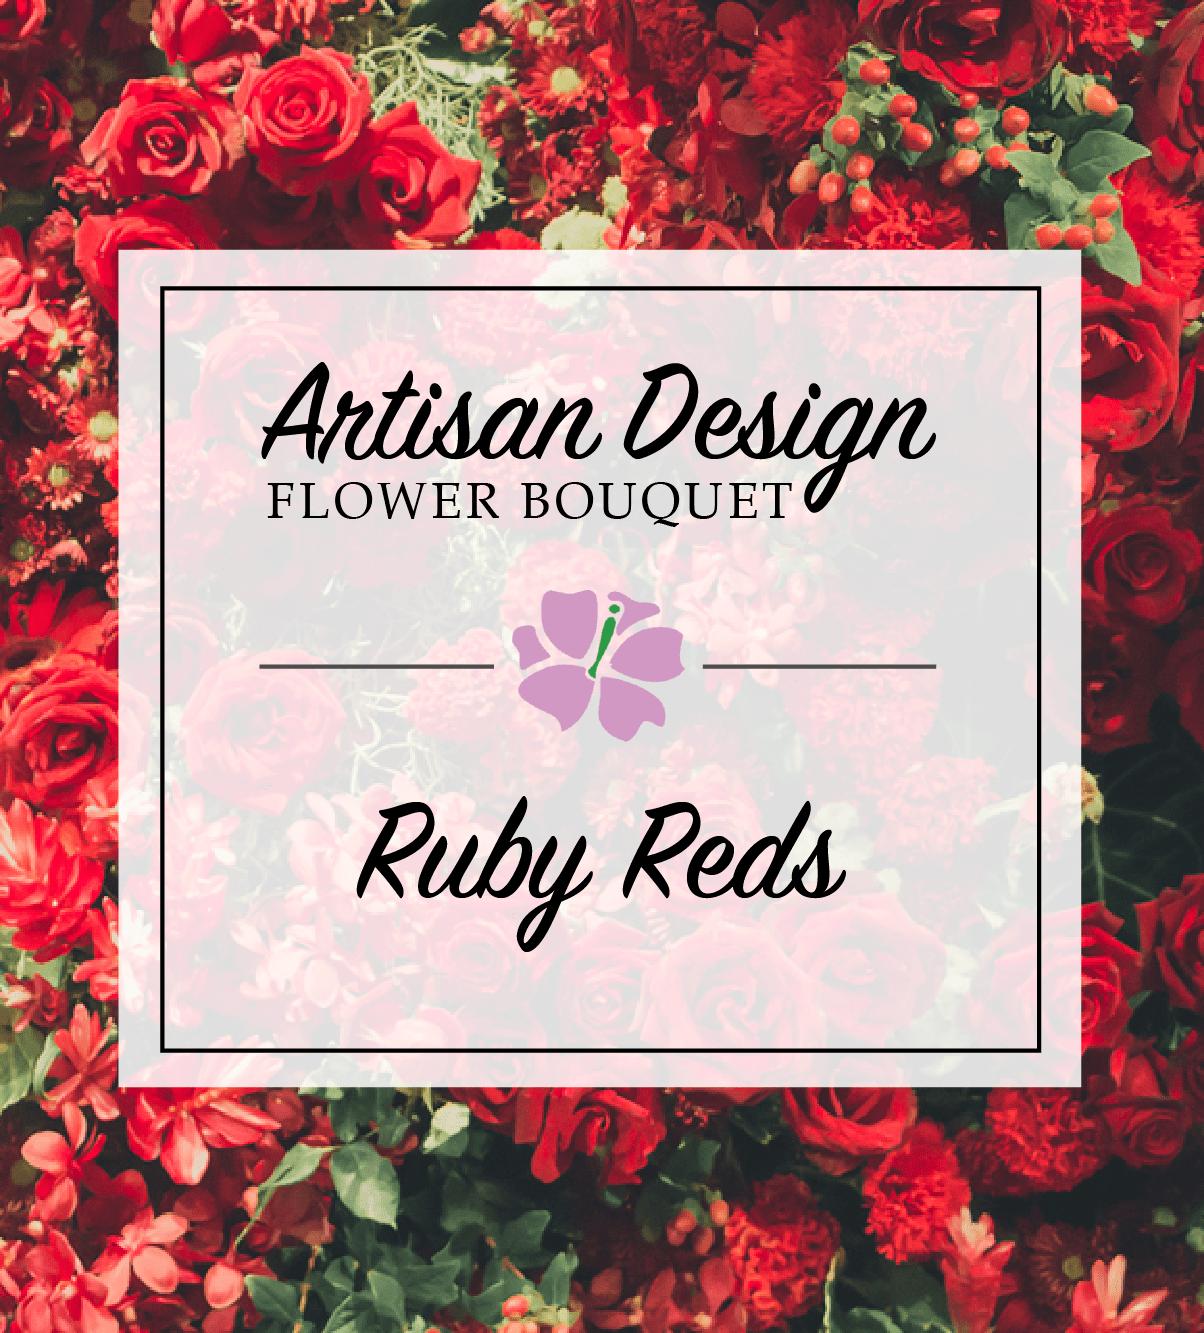 Artist Design: Ruby Reds